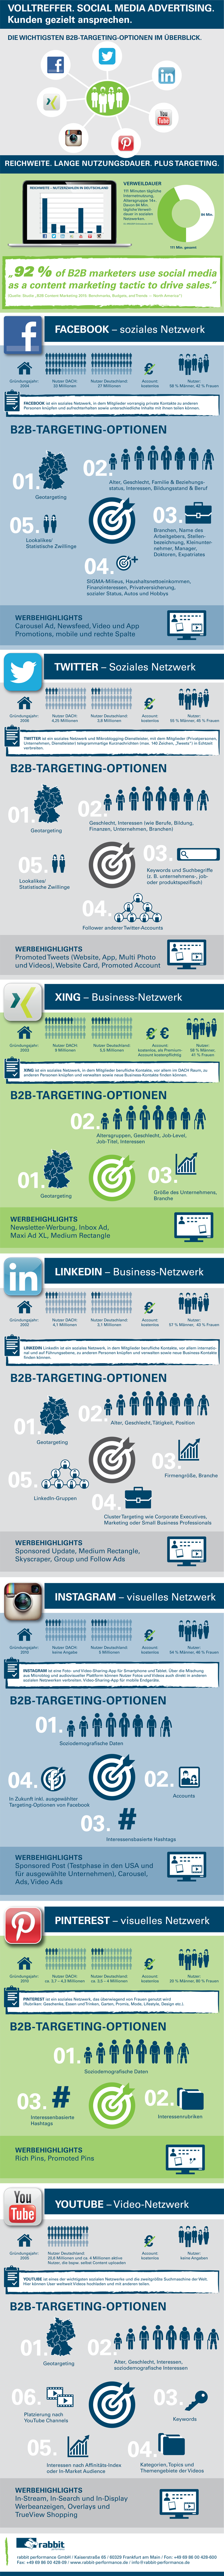 Richtige B2B Zielgruppenansprache auf Social Media